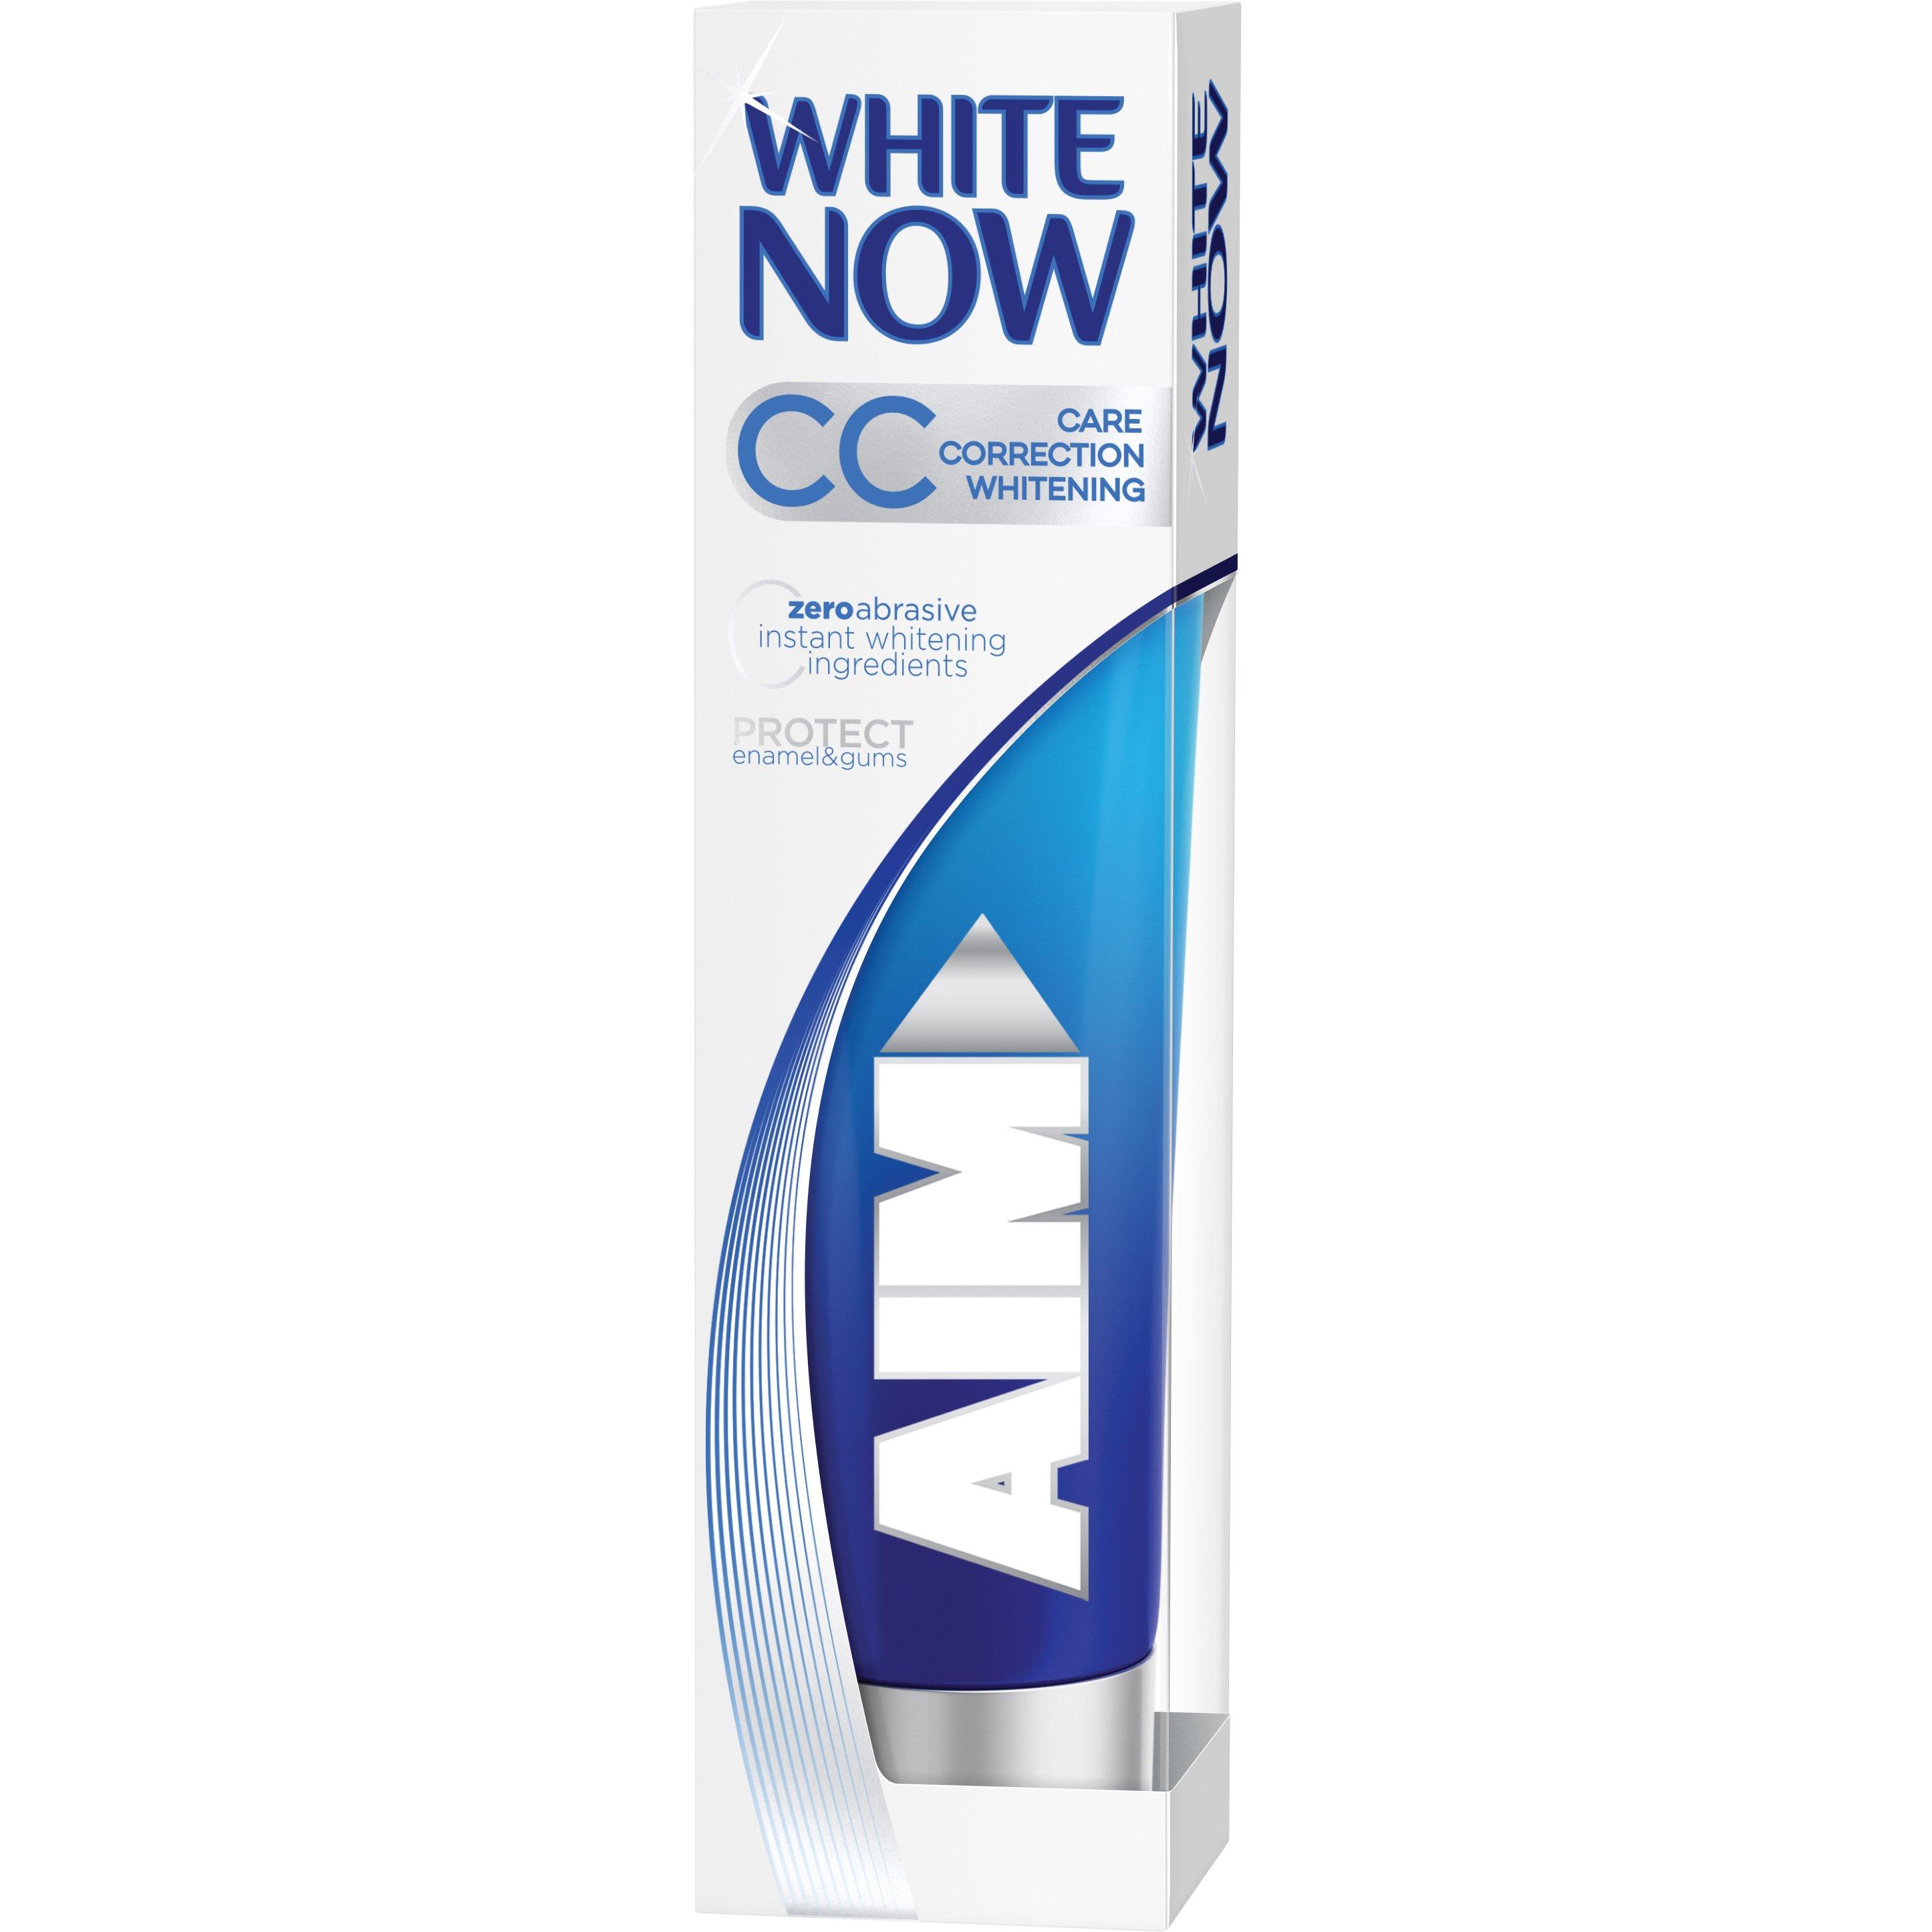 Aim White Now CC Οδοντόκρεμα με Συστατικό Μηδενικής Αποτριβής για Άμεση Λεύκανση,Προστατεύει Σμάλτο & Ούλα 75ml